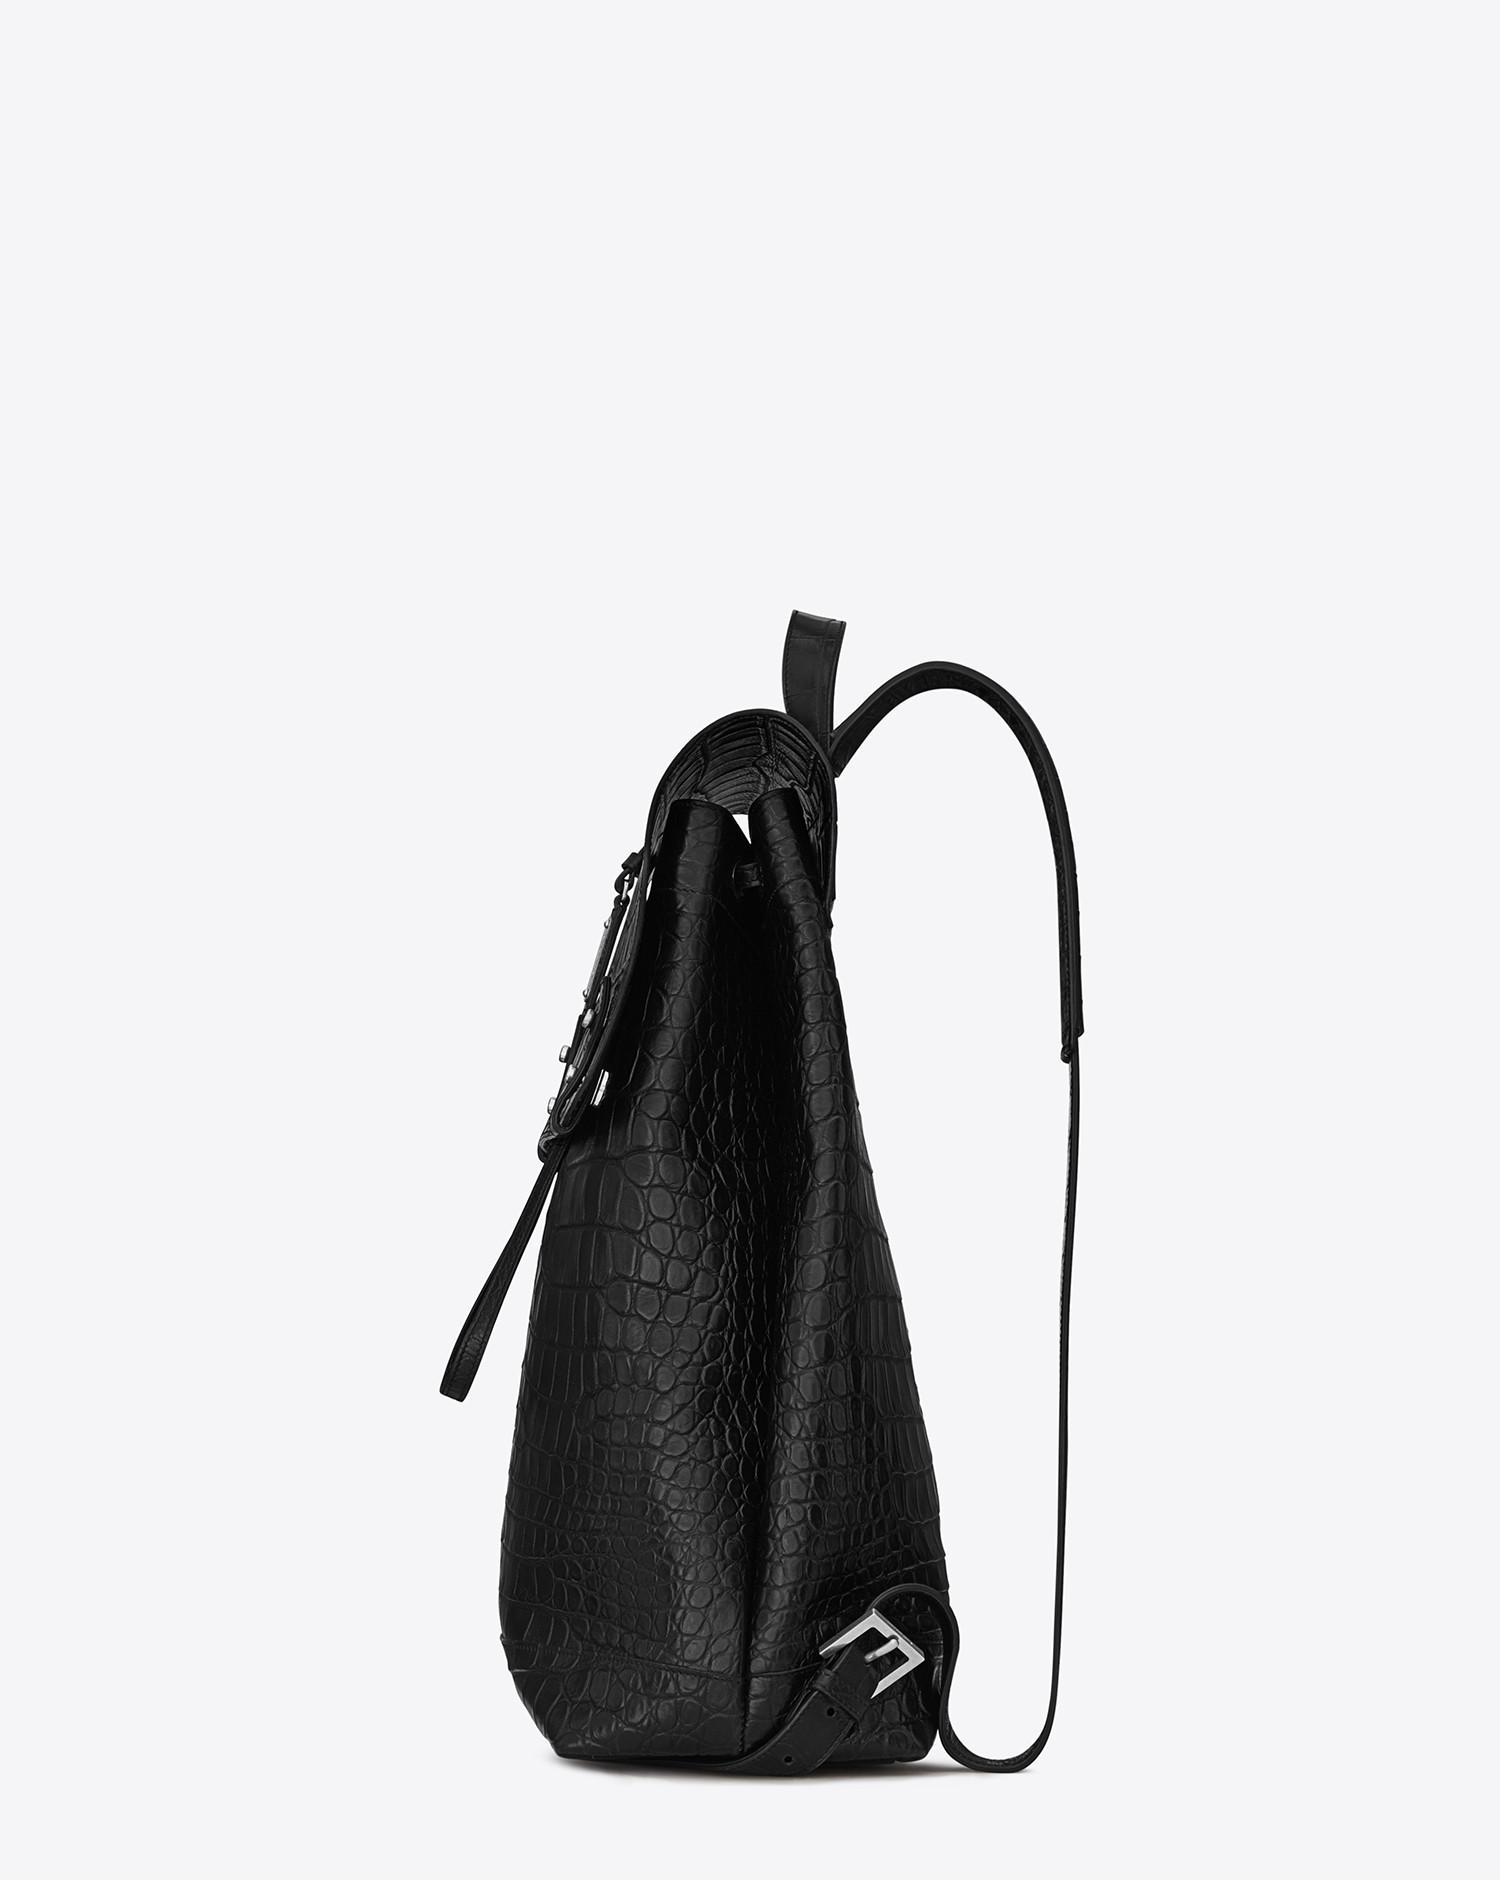 Saint Laurent. Men s Black Sac De Jour Backpack In Crocodile Embossed  Leather 1fc83f981340c